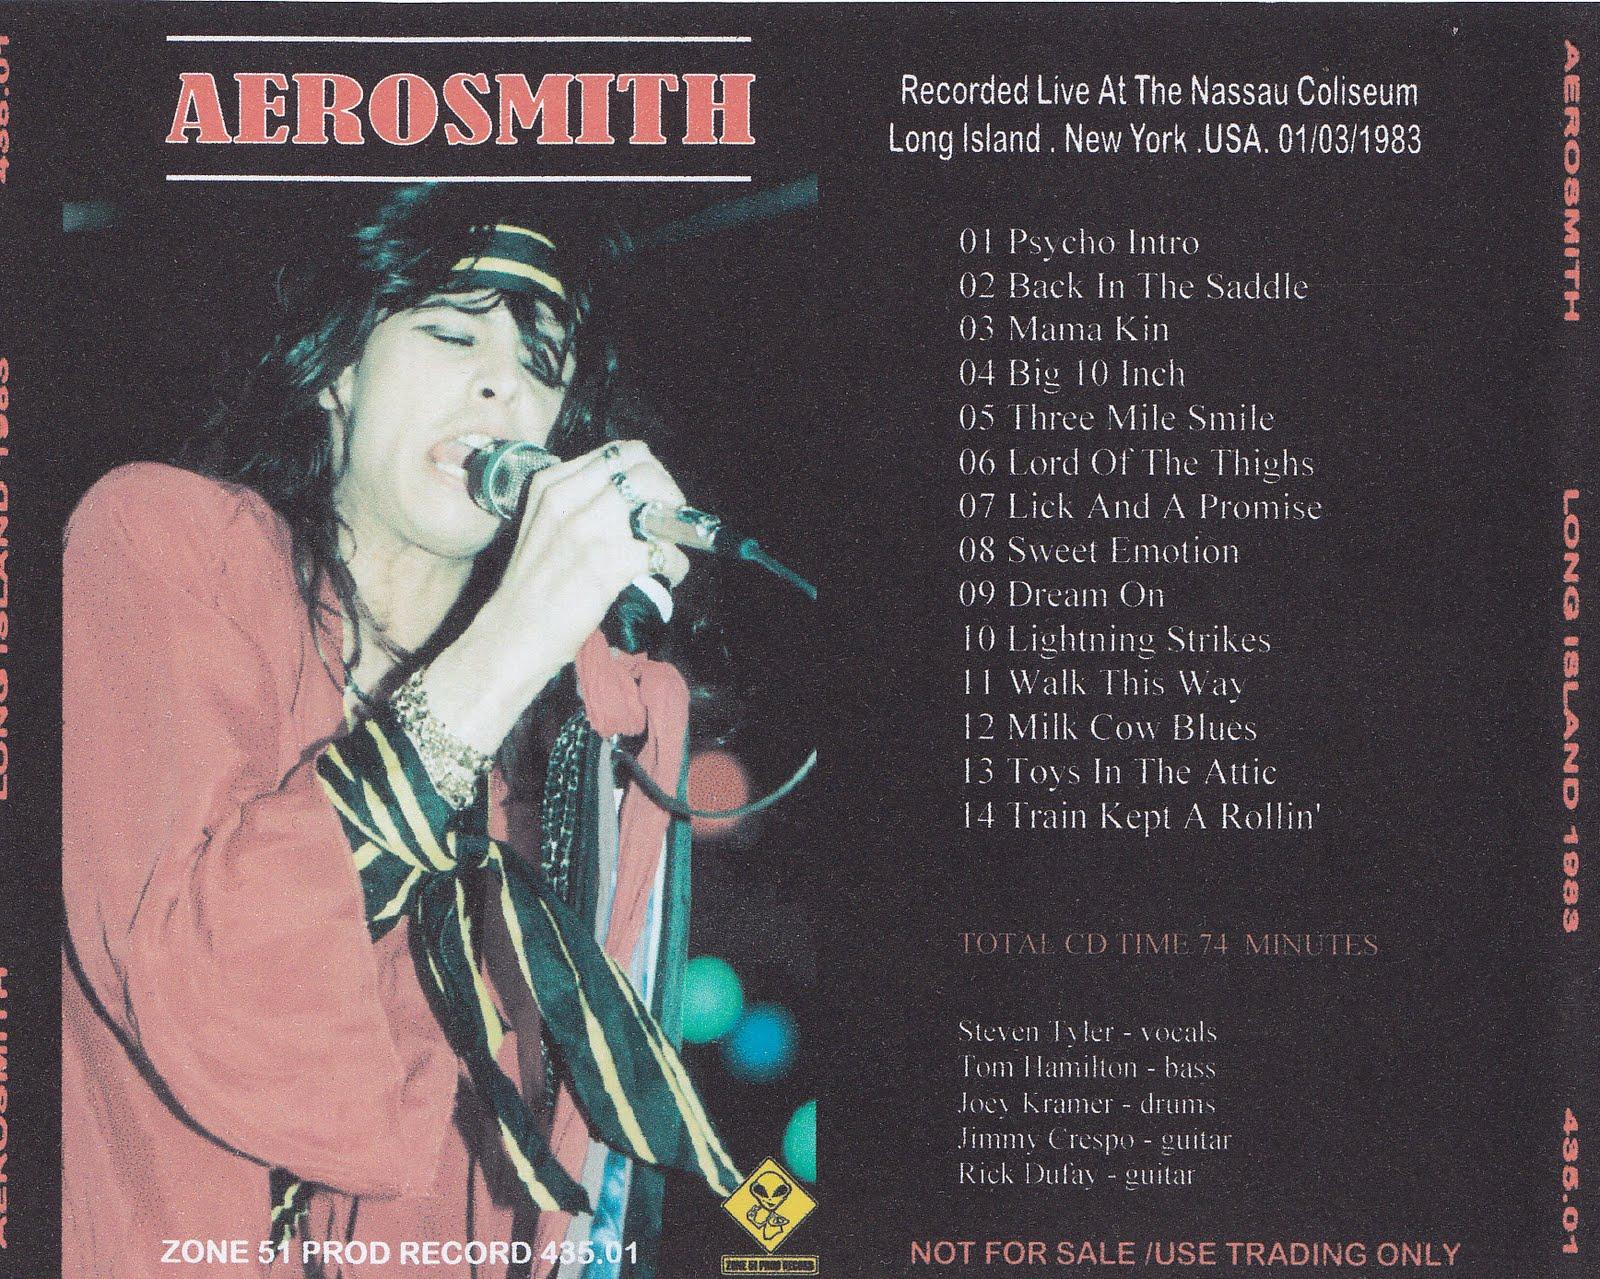 Aerosmith Bootlegs Cover Arts Long Island 1983